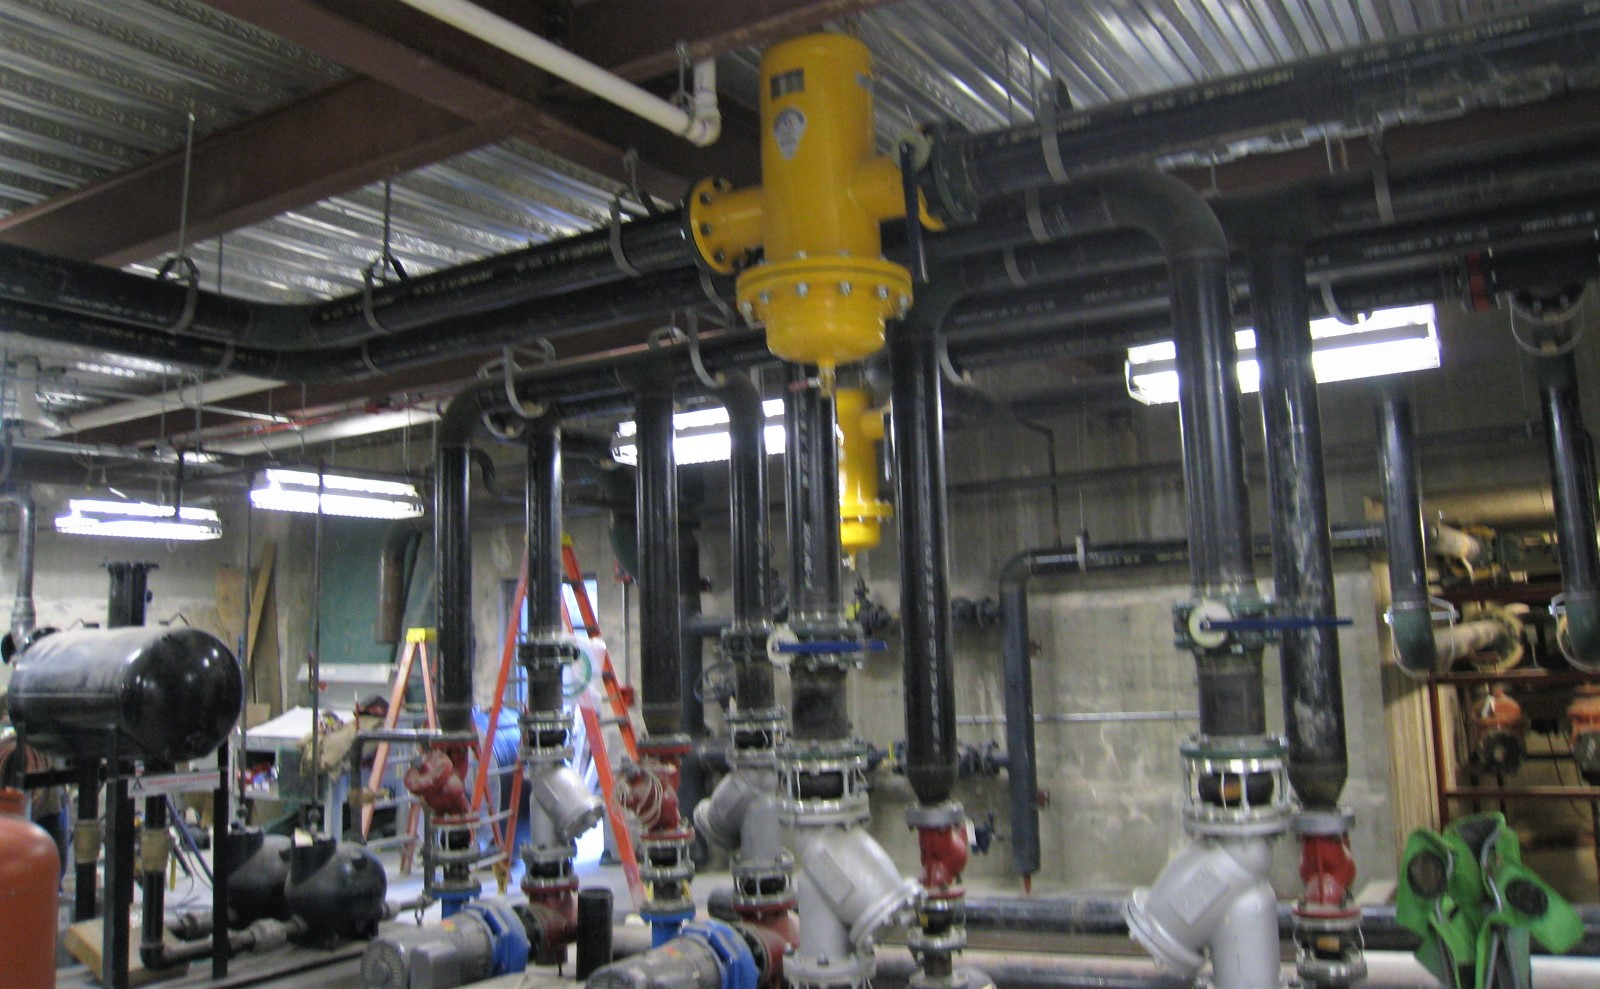 Mechanical Plumbing Pipes